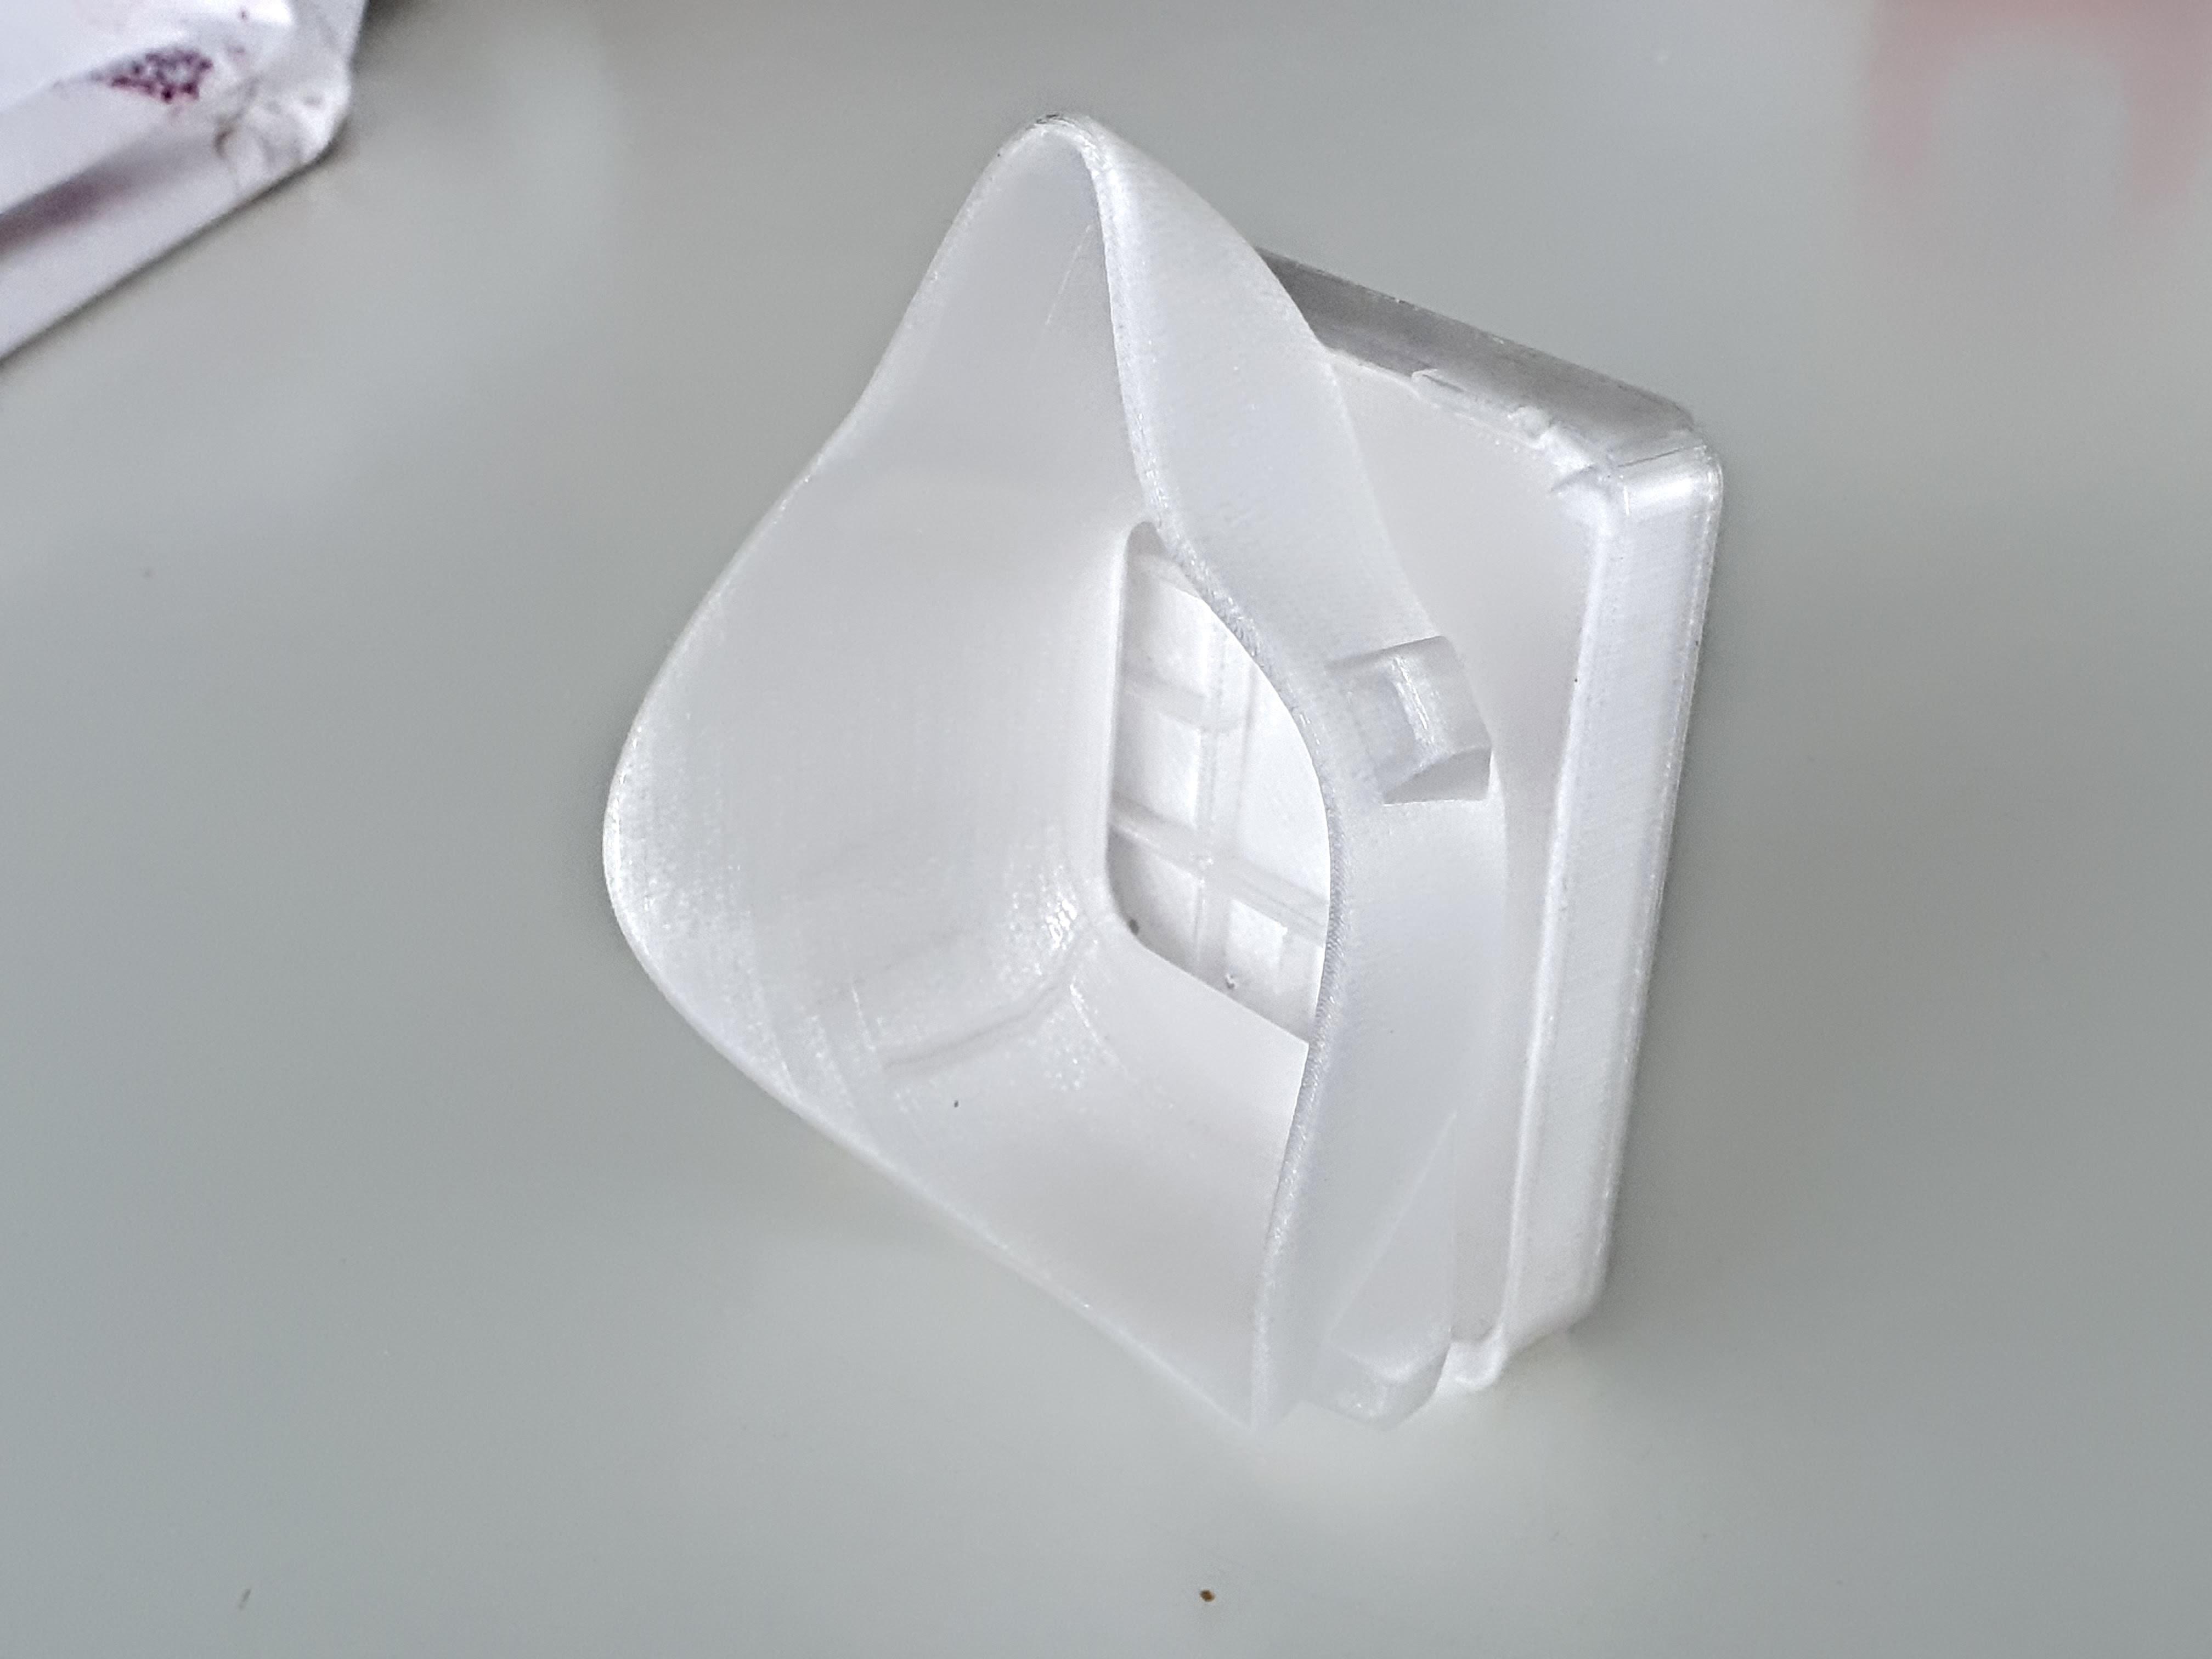 20200321_122113.jpg Download free STL file Covid corona mask - use with vacuum cleaner bag. Easy breathing.  • 3D printing template, mcermak